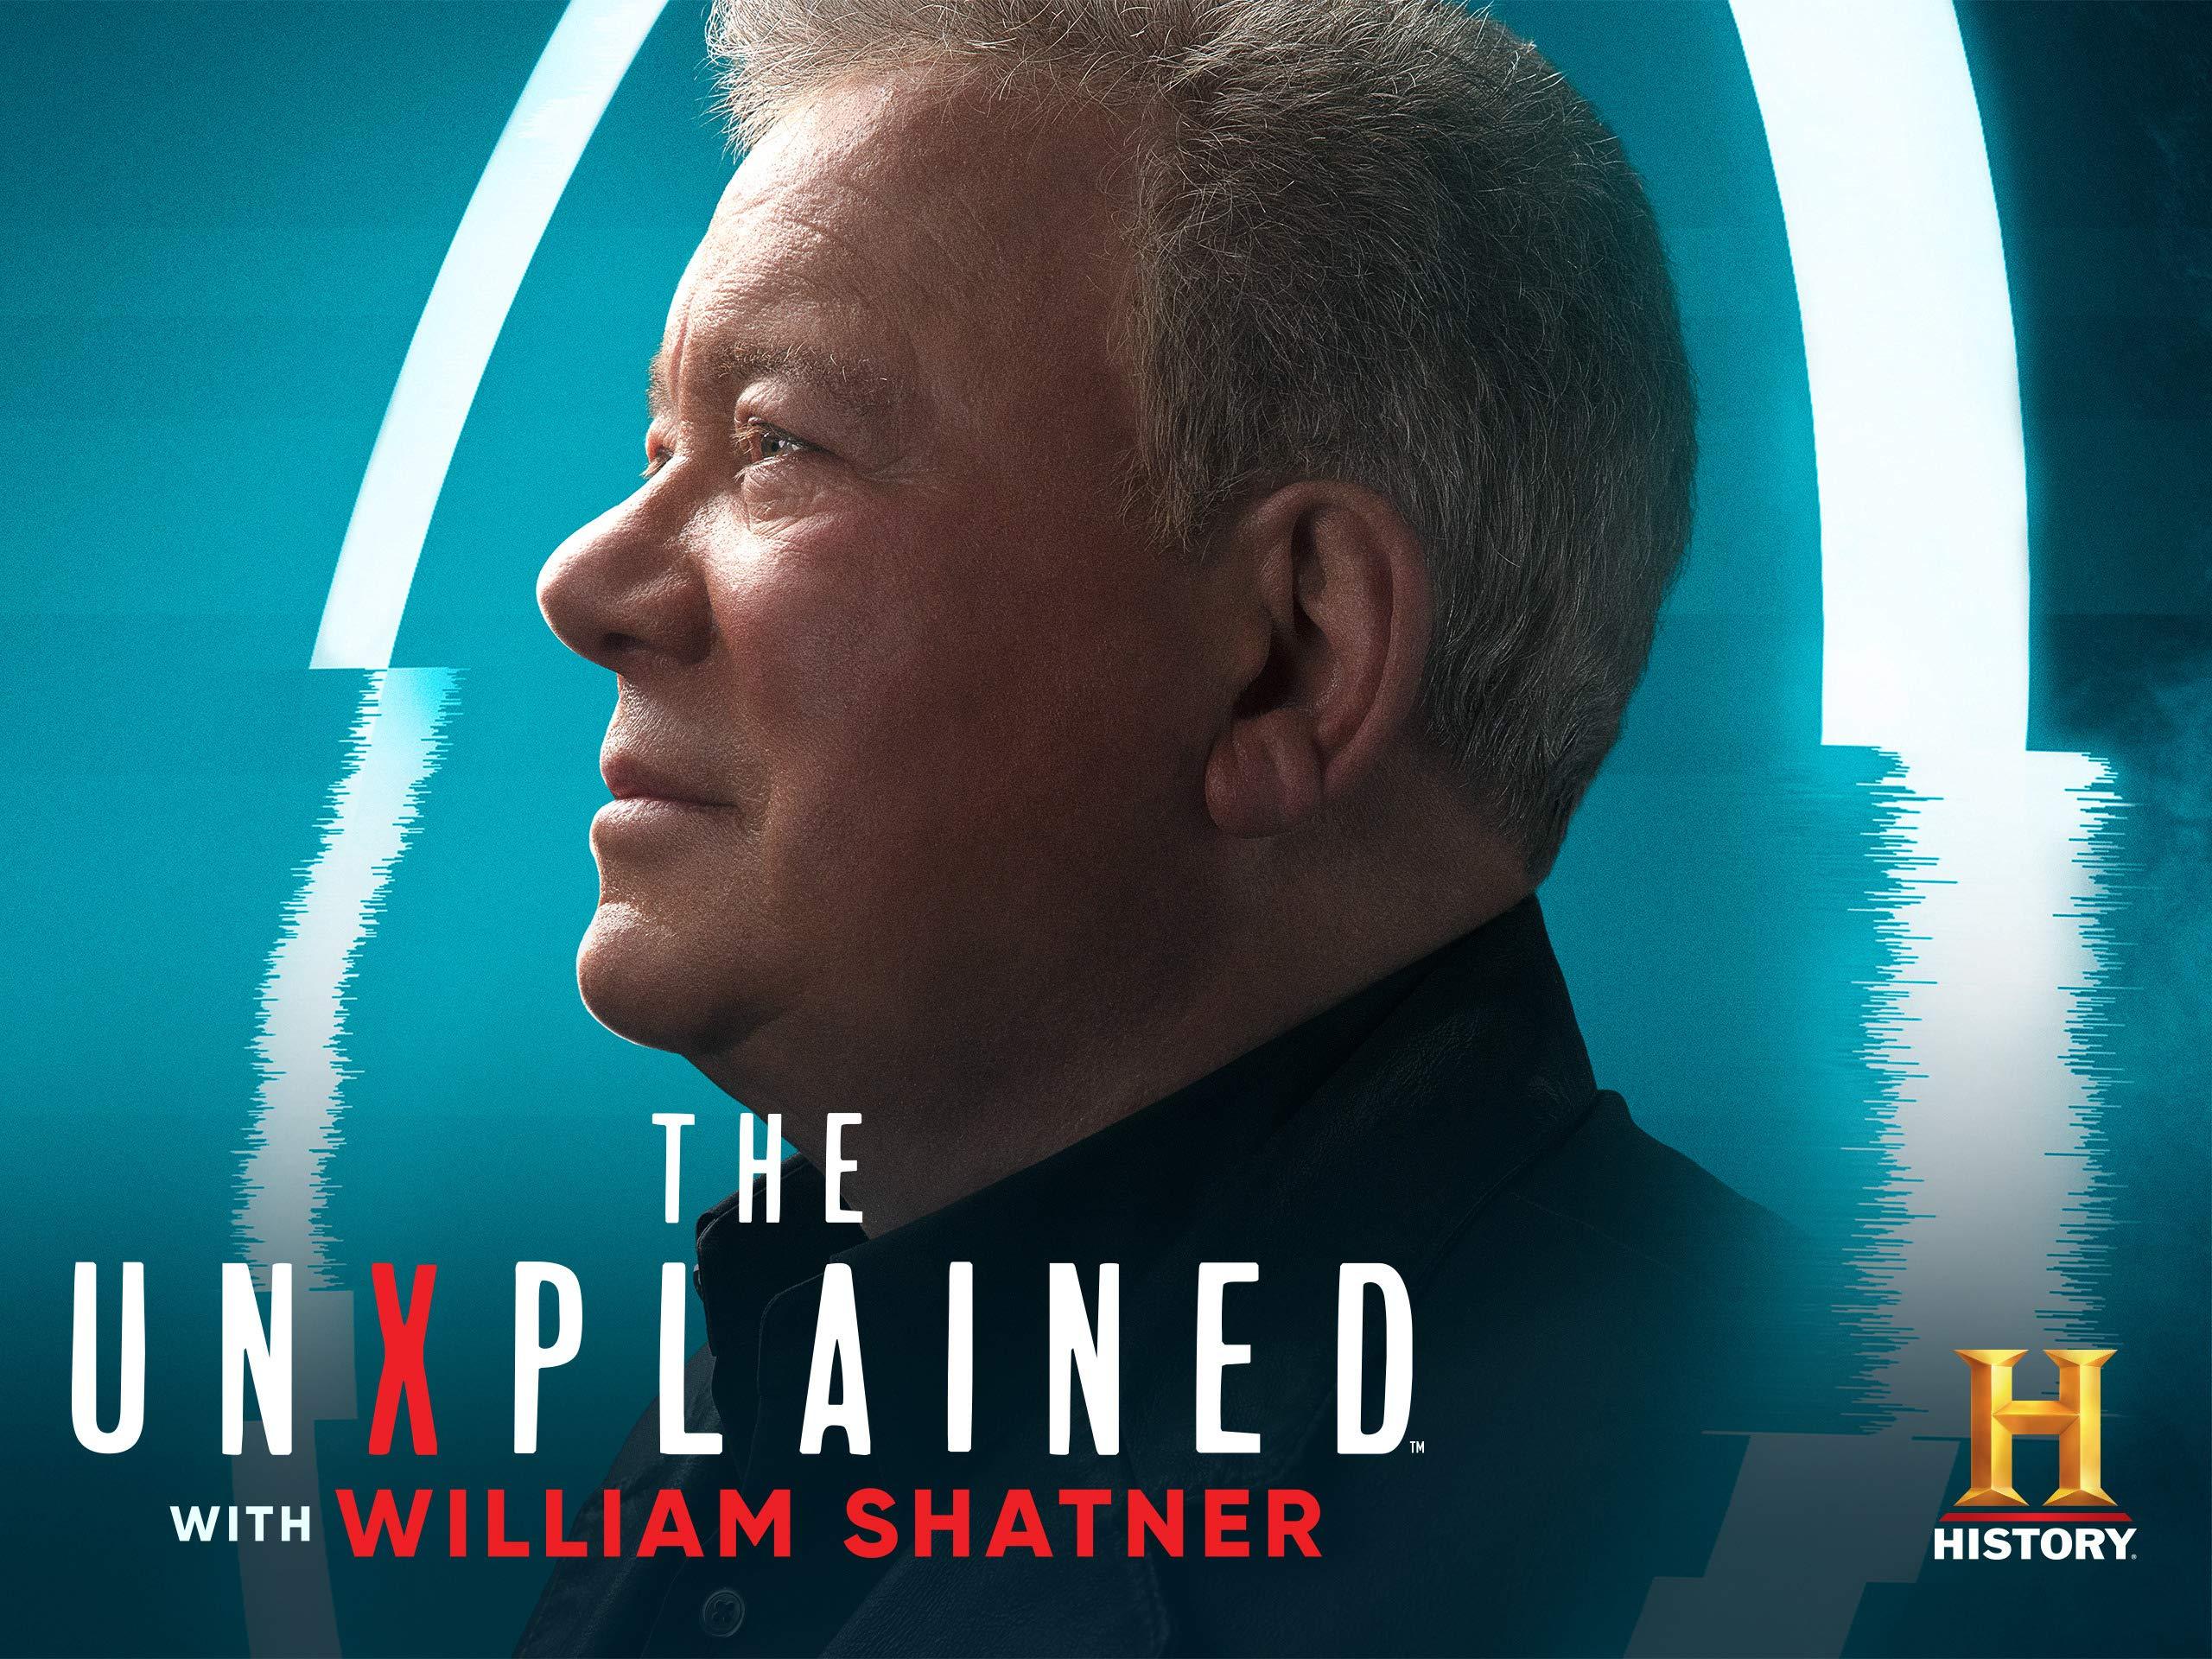 Watch The Unxplained Season 1 Prime Video